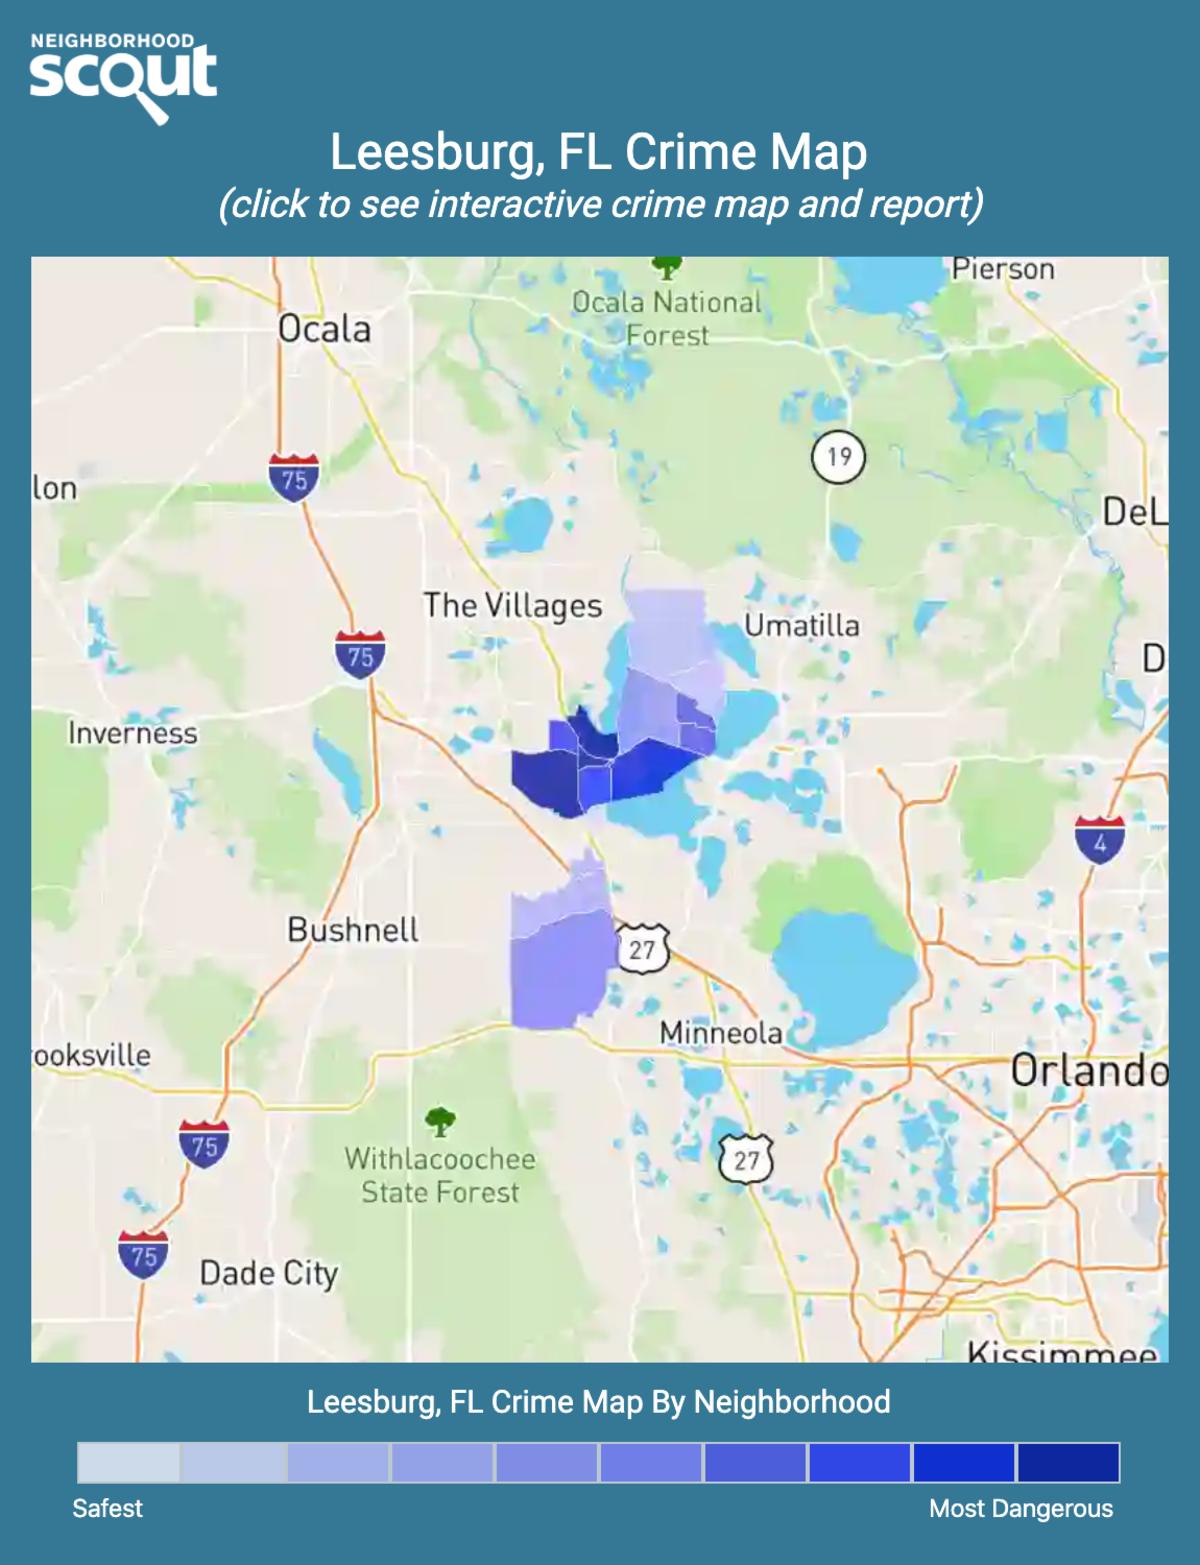 Leesburg, Florida crime map